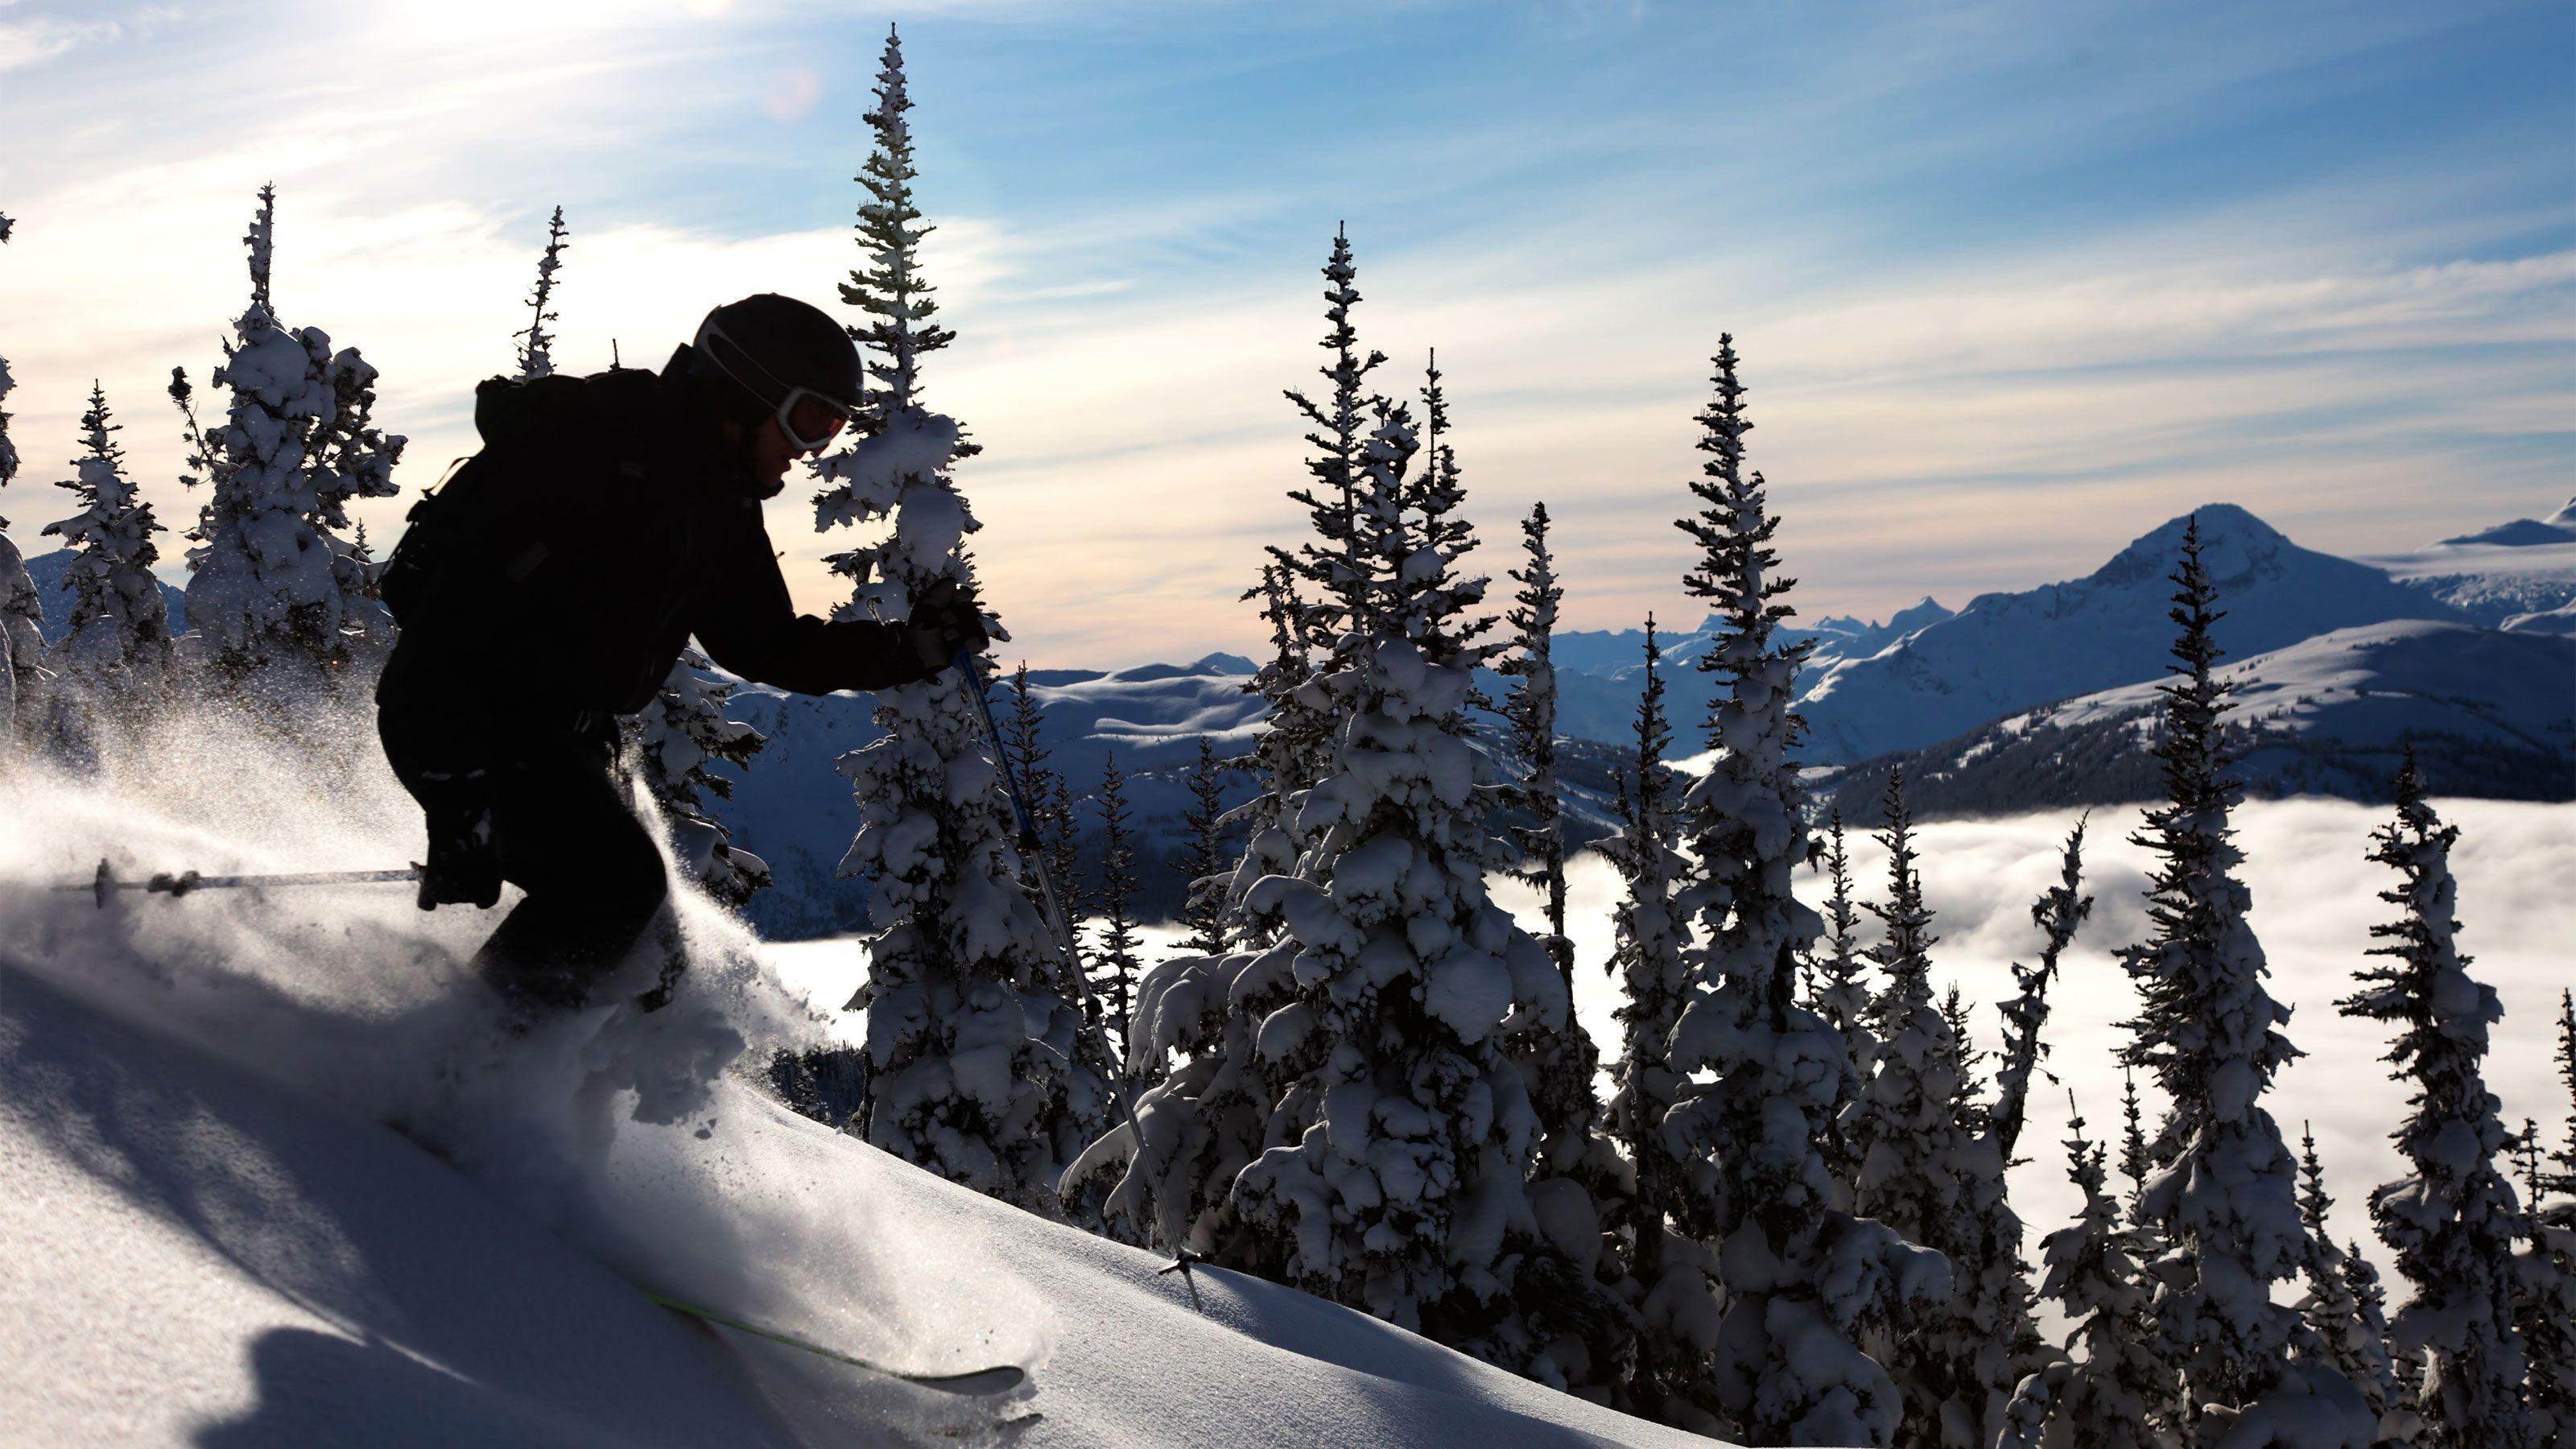 Skier descending the slopes of Banff